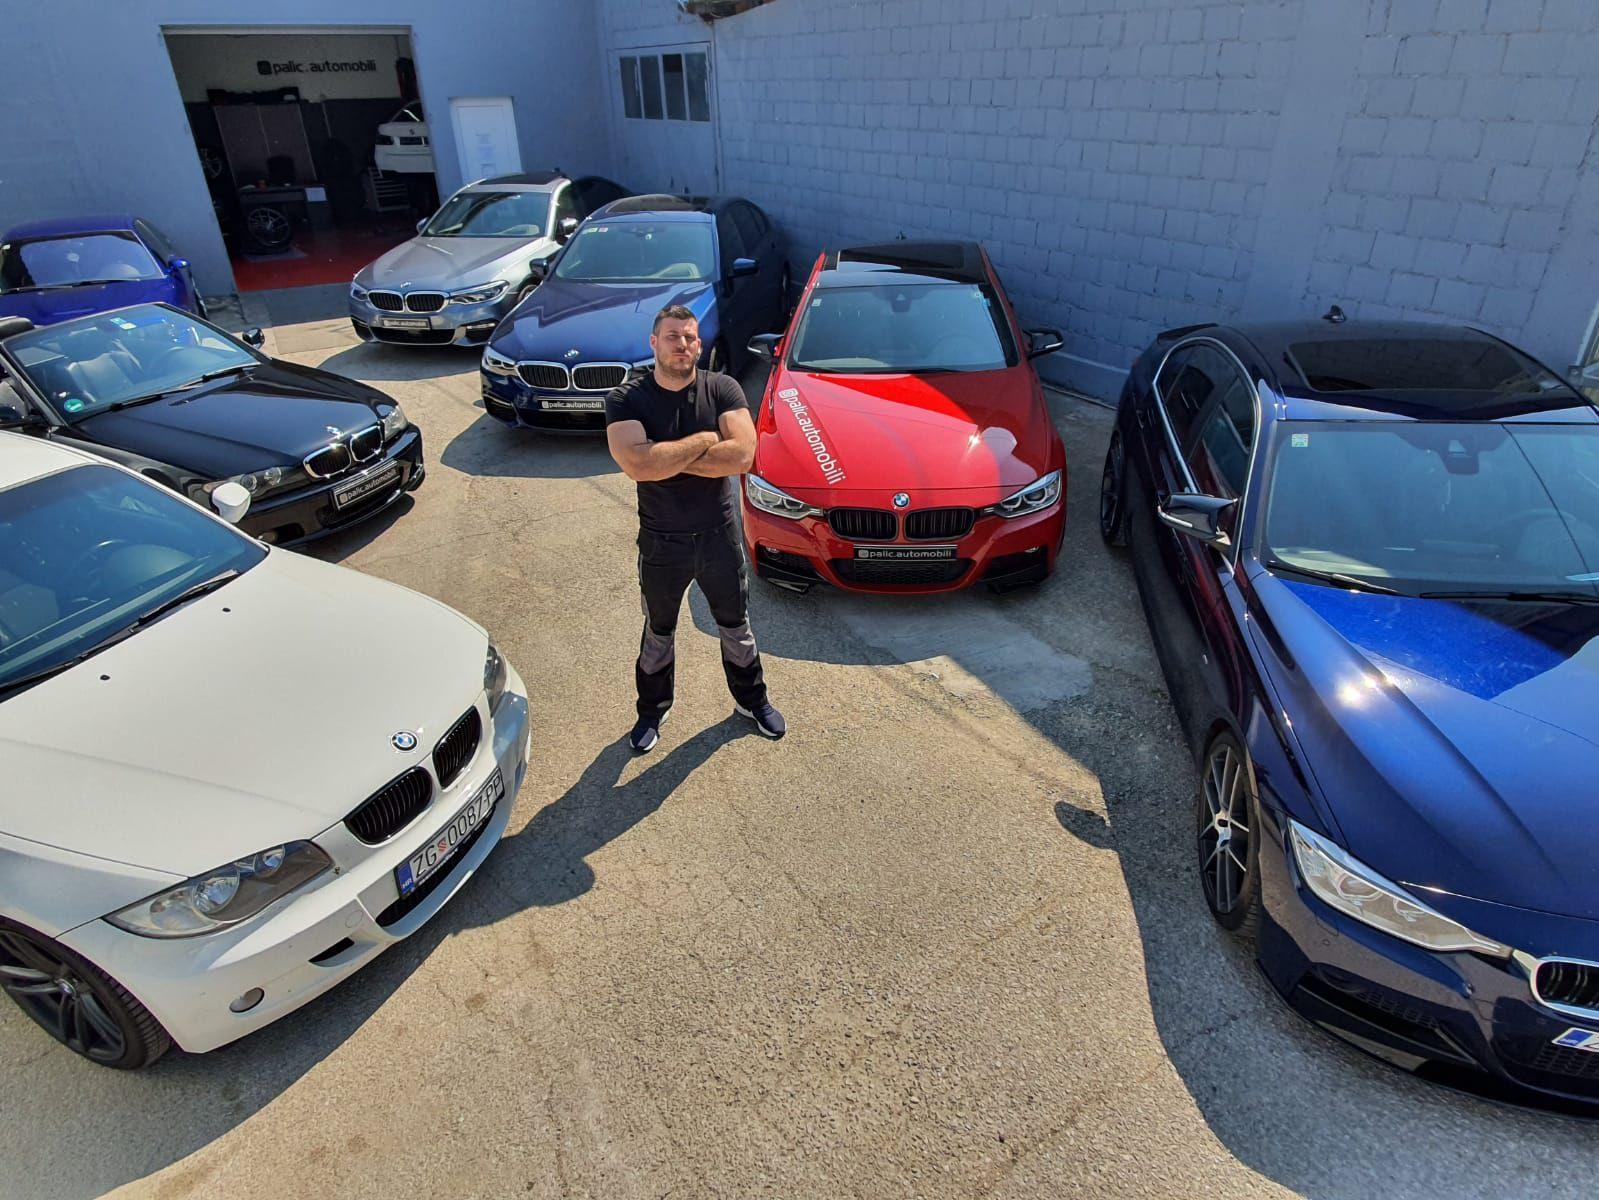 Palić Automobili BMW Sesvete DriveTeam